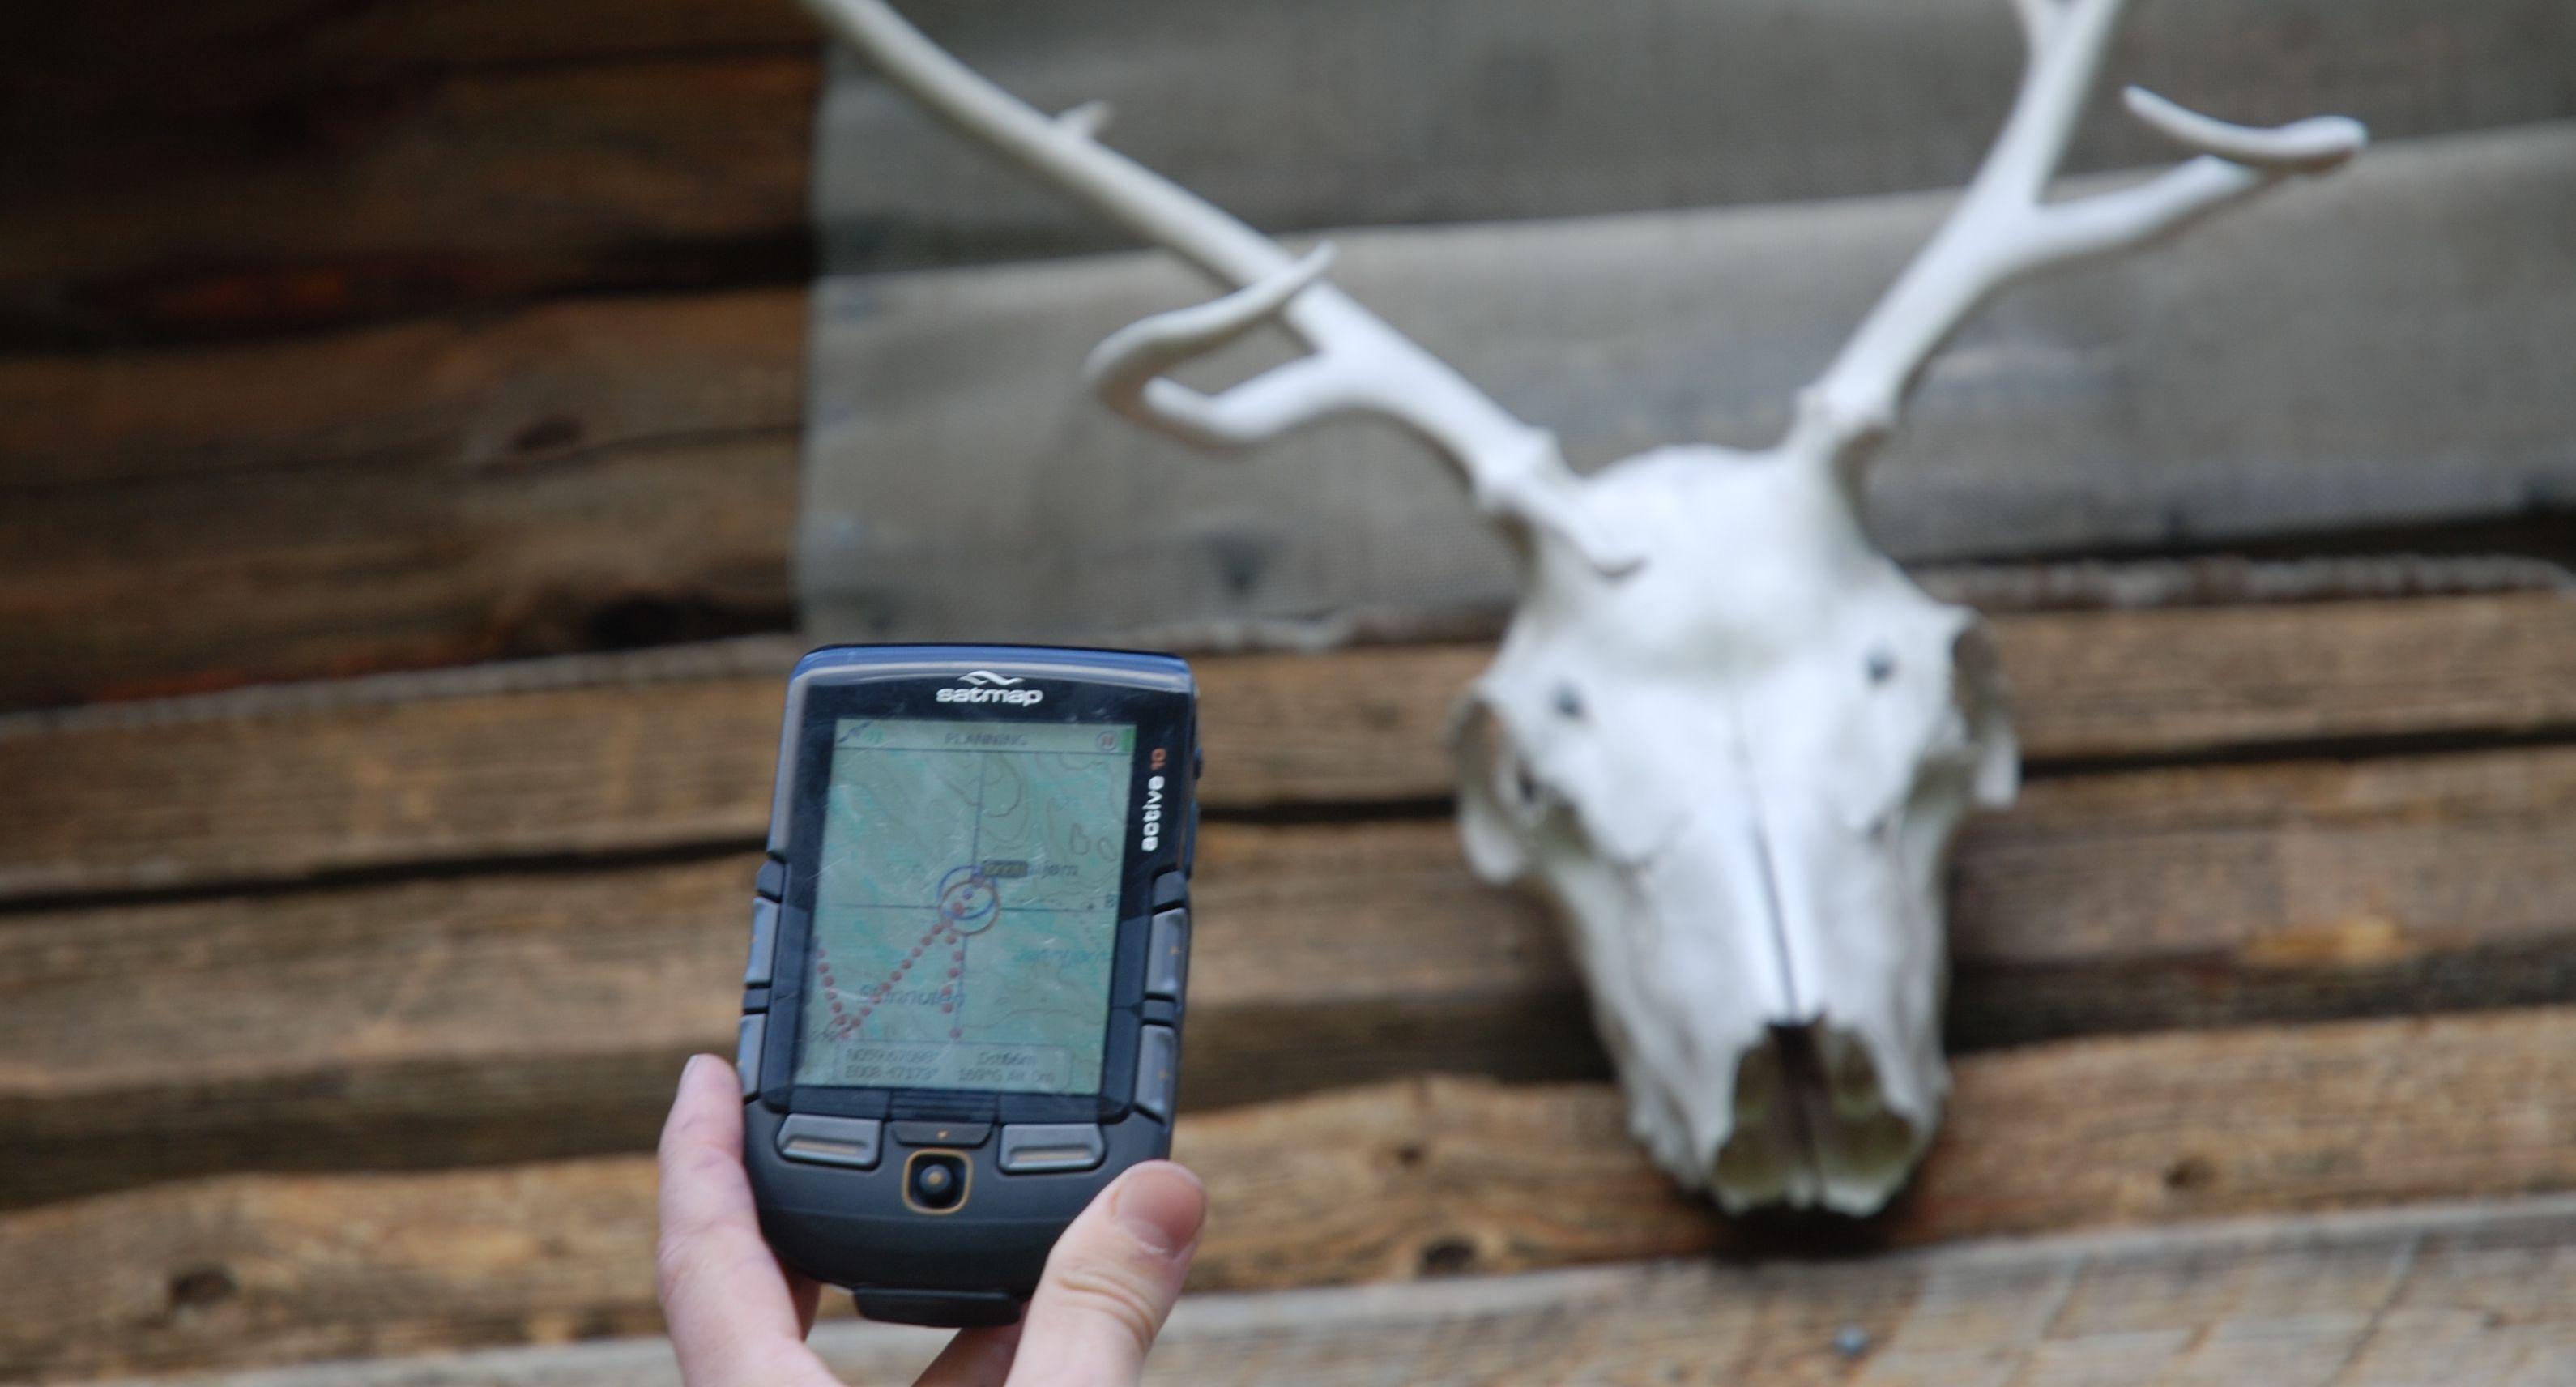 Satmap Active 10 er testens største GPS.